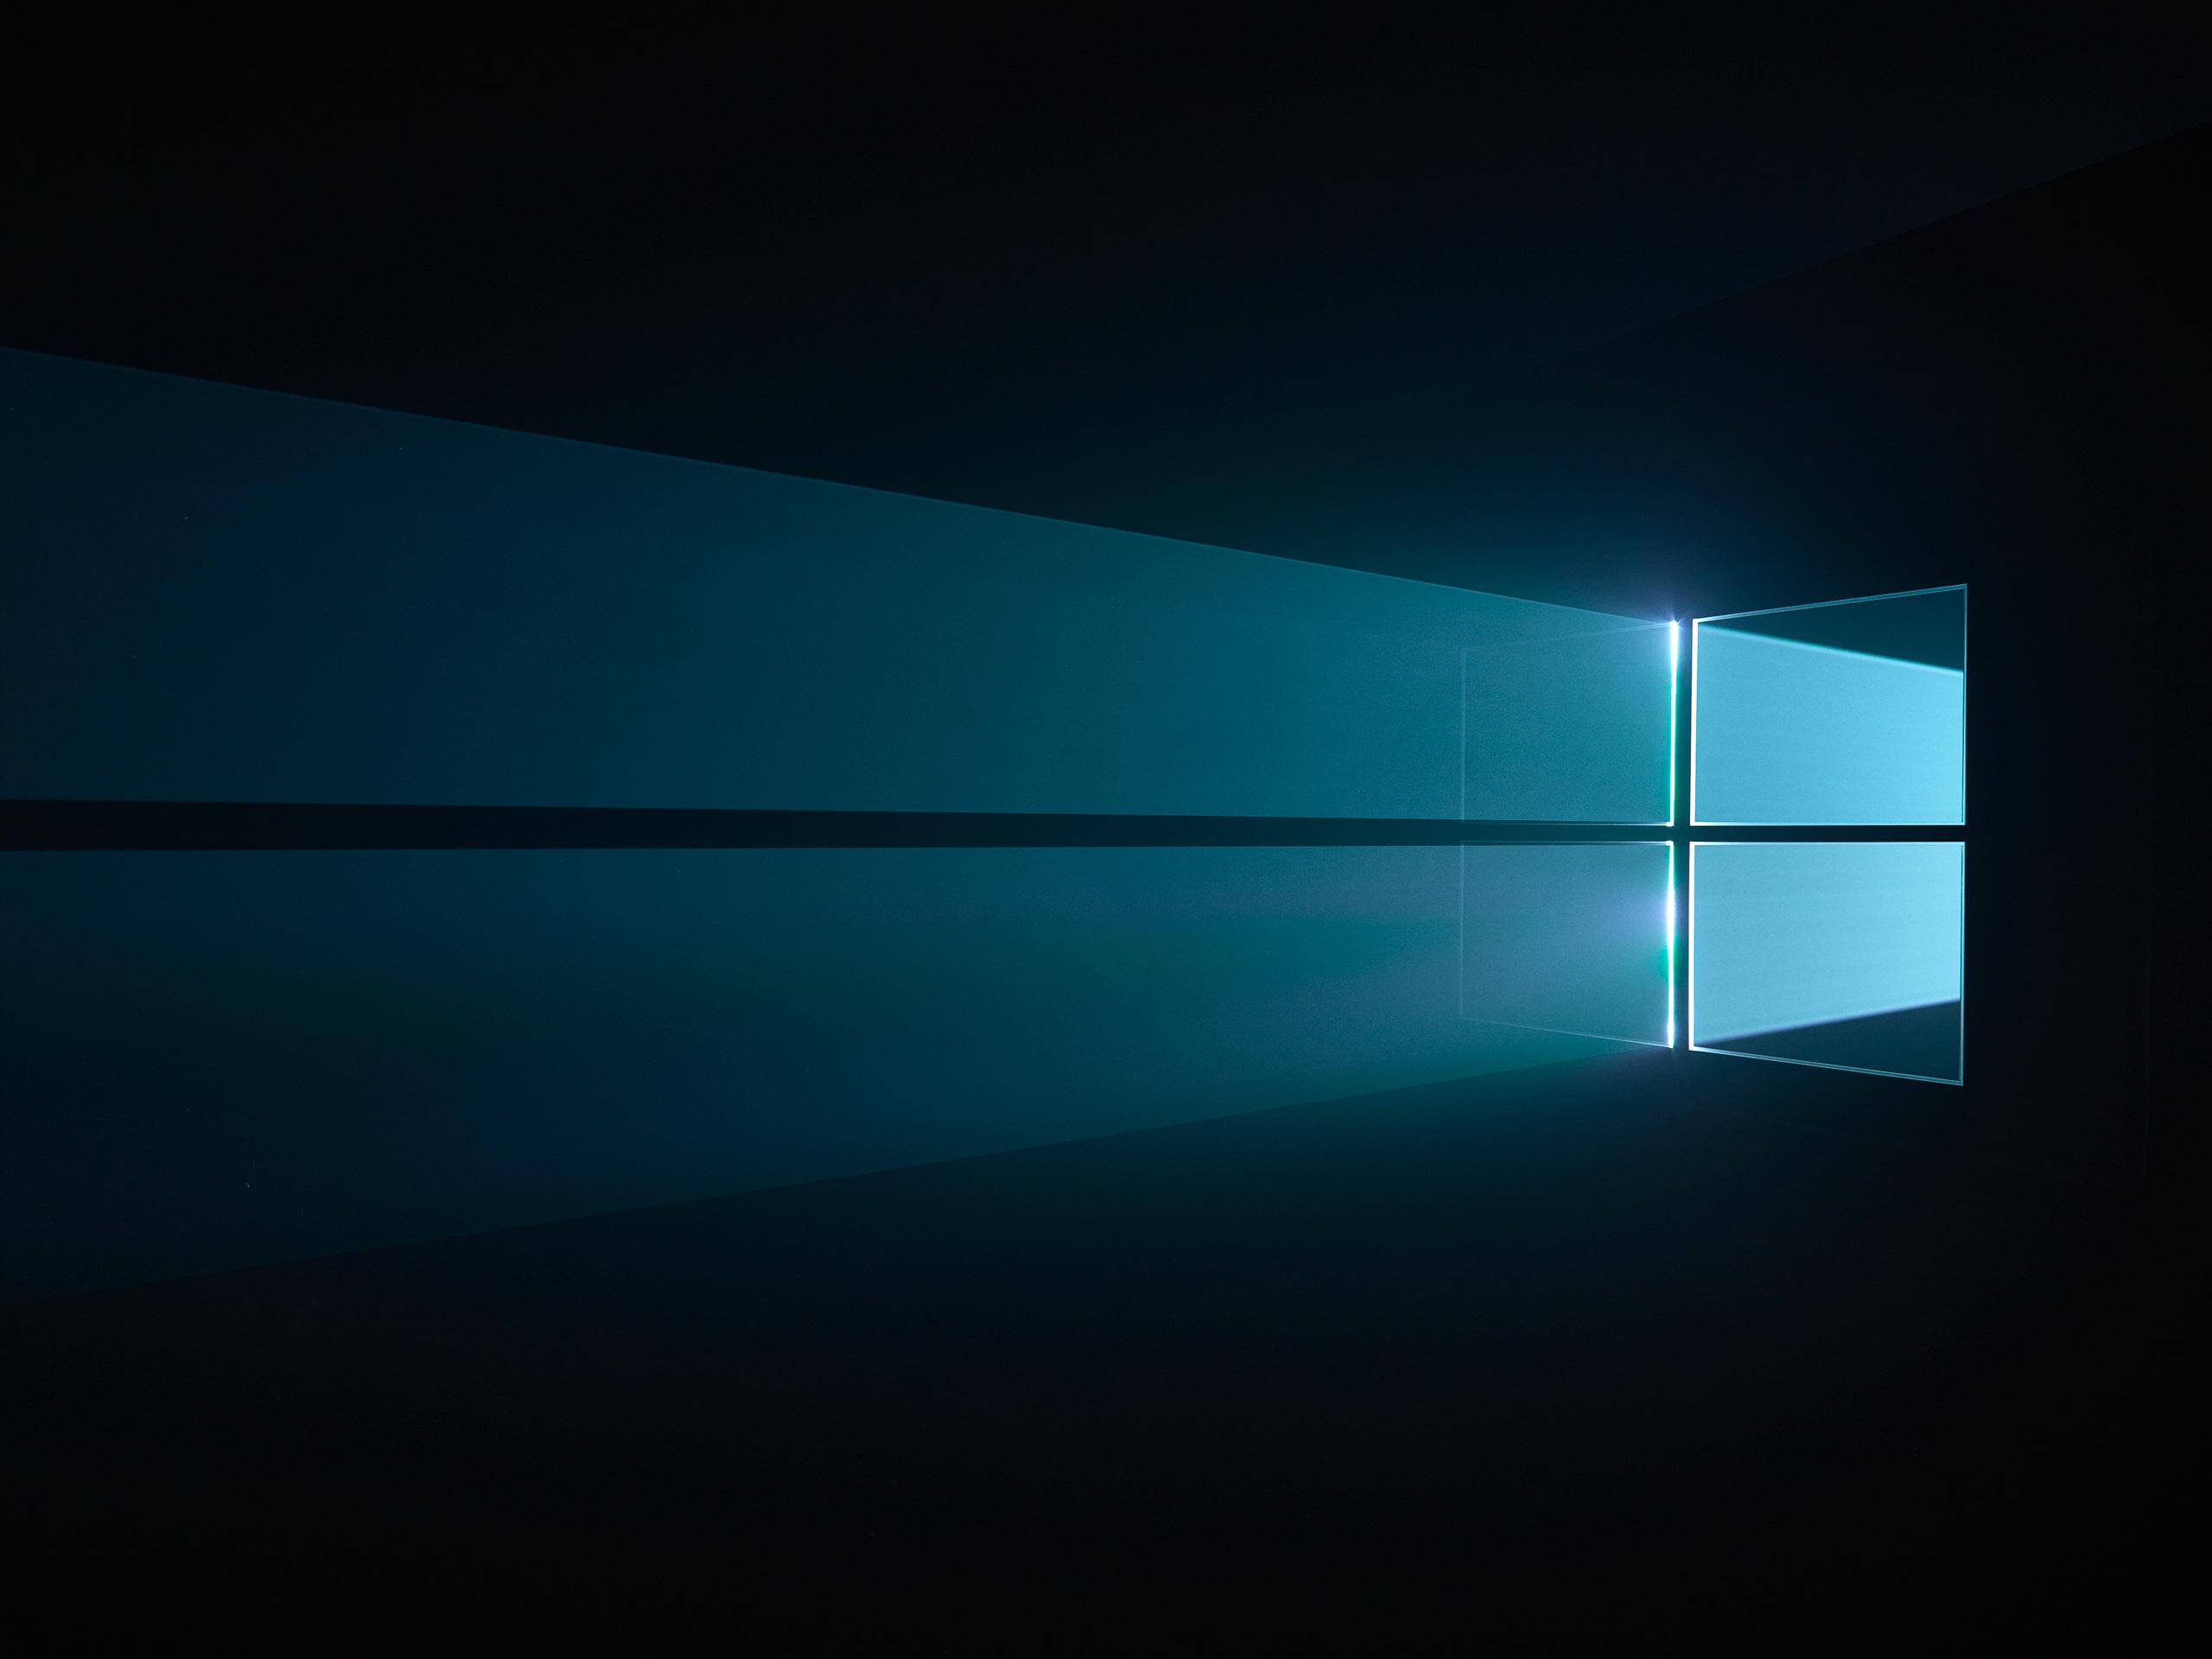 windows 10 blue background